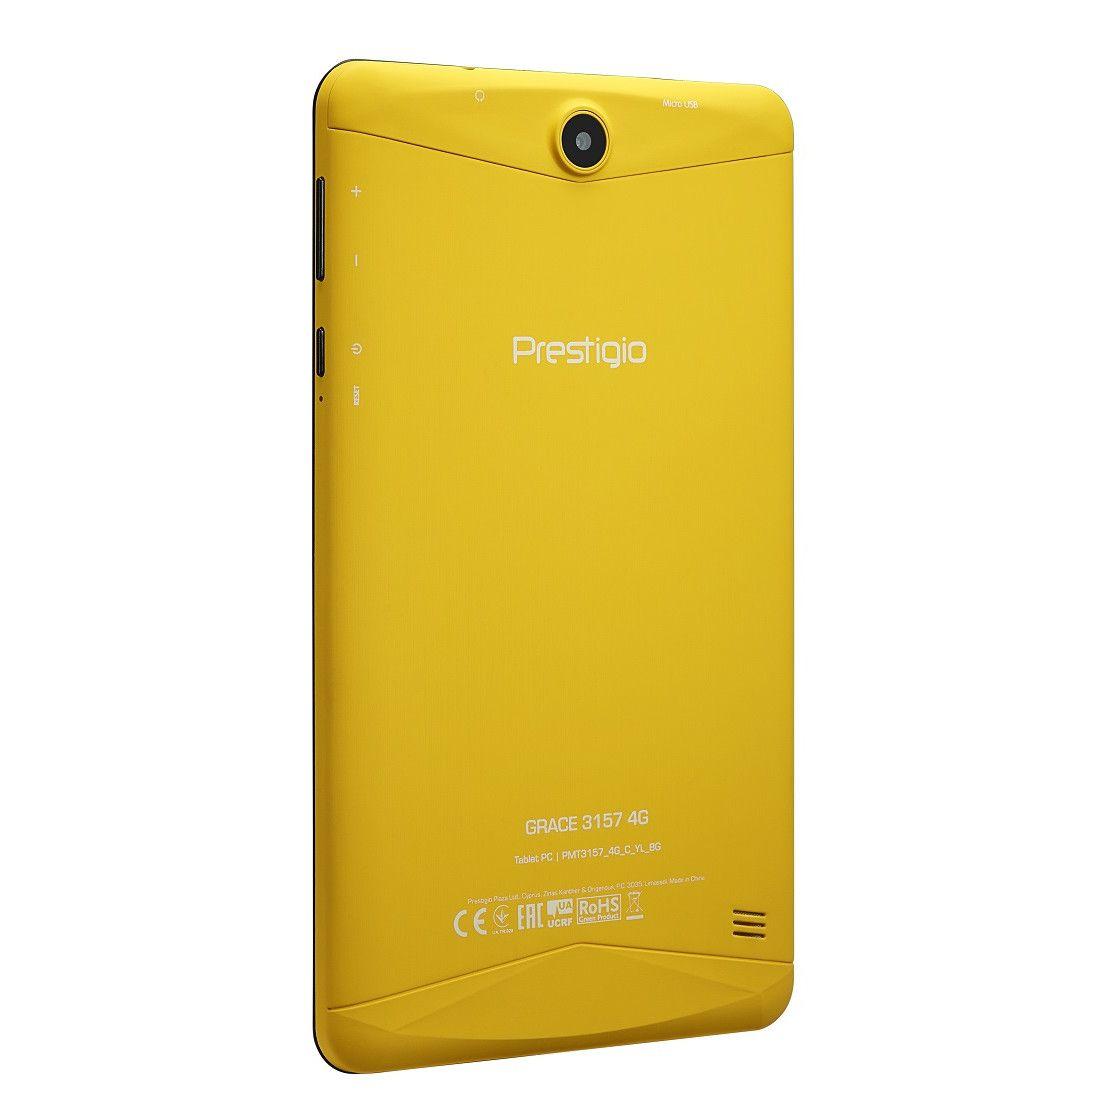 Таблет Prestigio Grace 3157 жълт